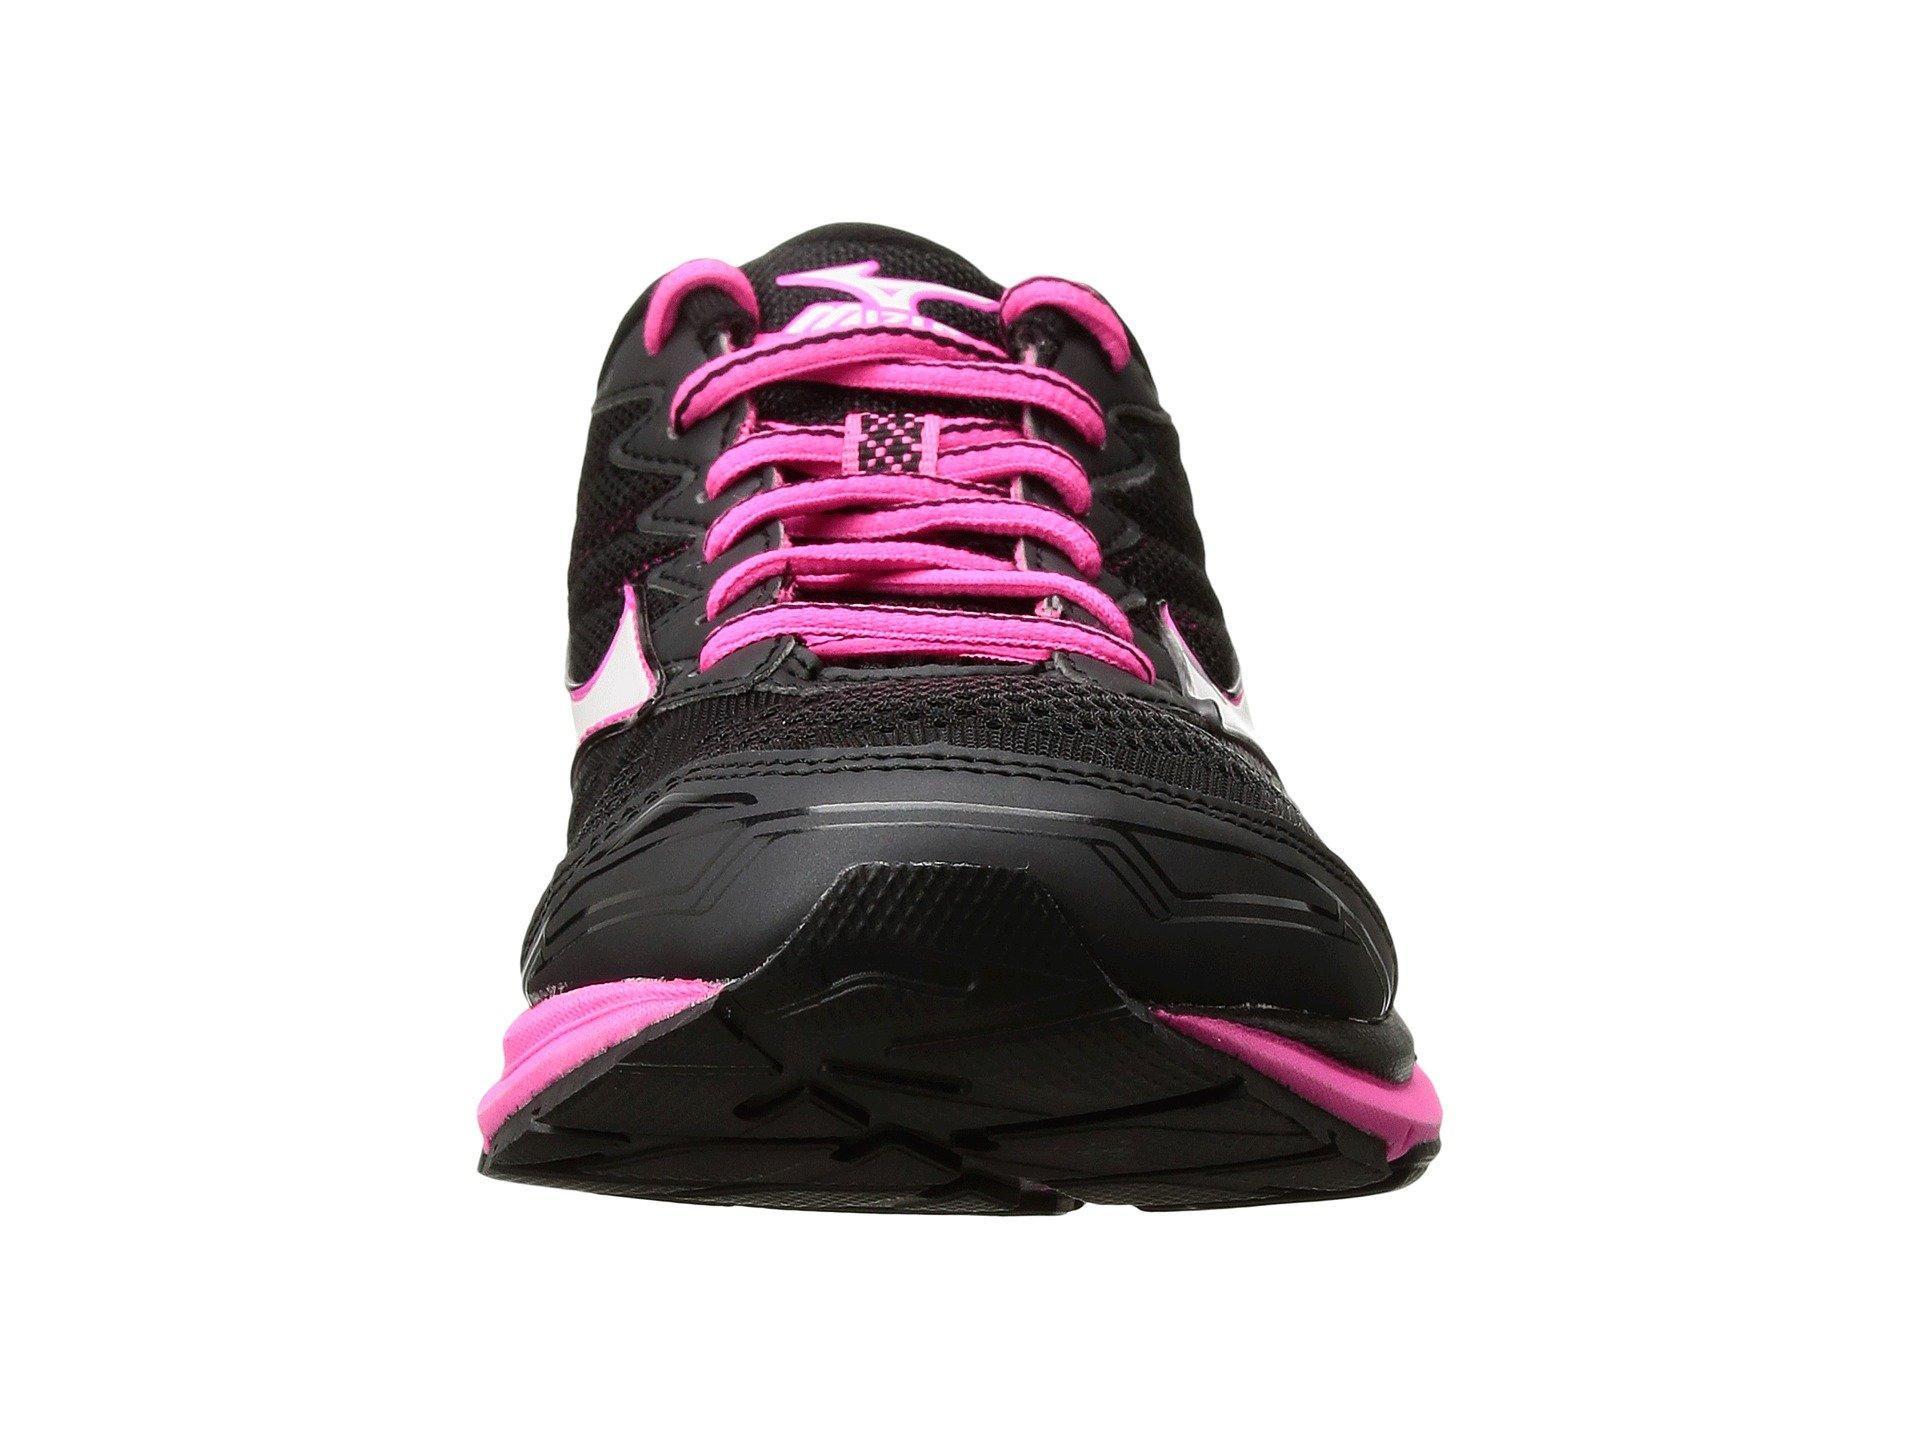 538c55220c5c mizuno wave cruise pink on sale > OFF48% Discounts